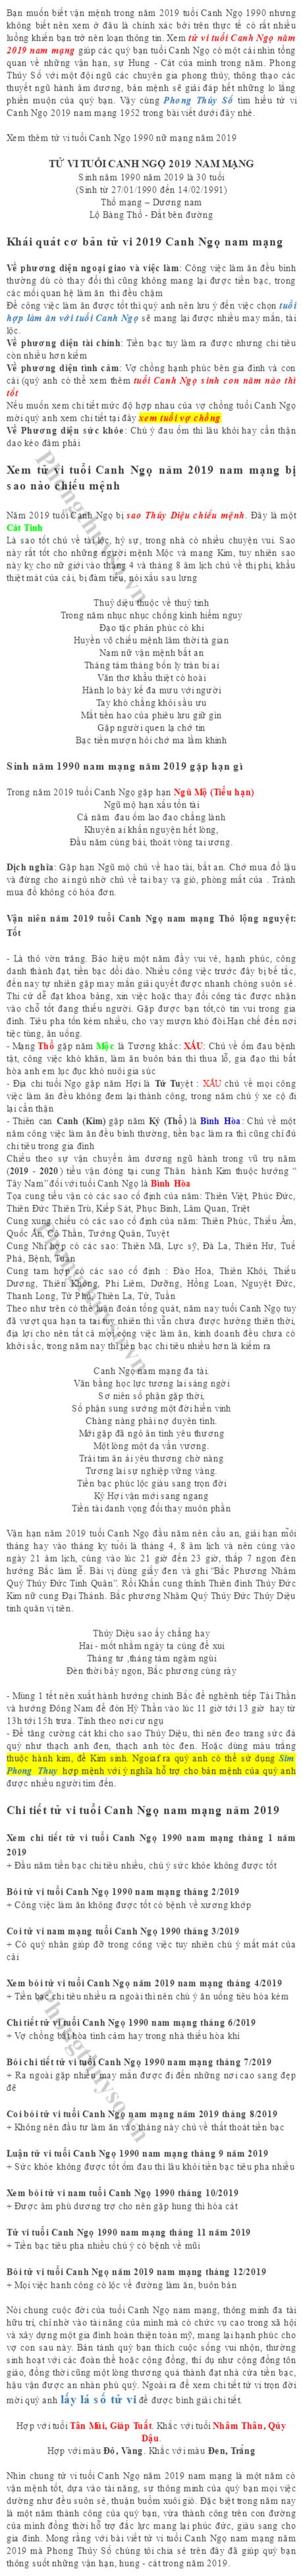 tu-vi-tuoi-canh-ngo-nam-2019-nam-mang